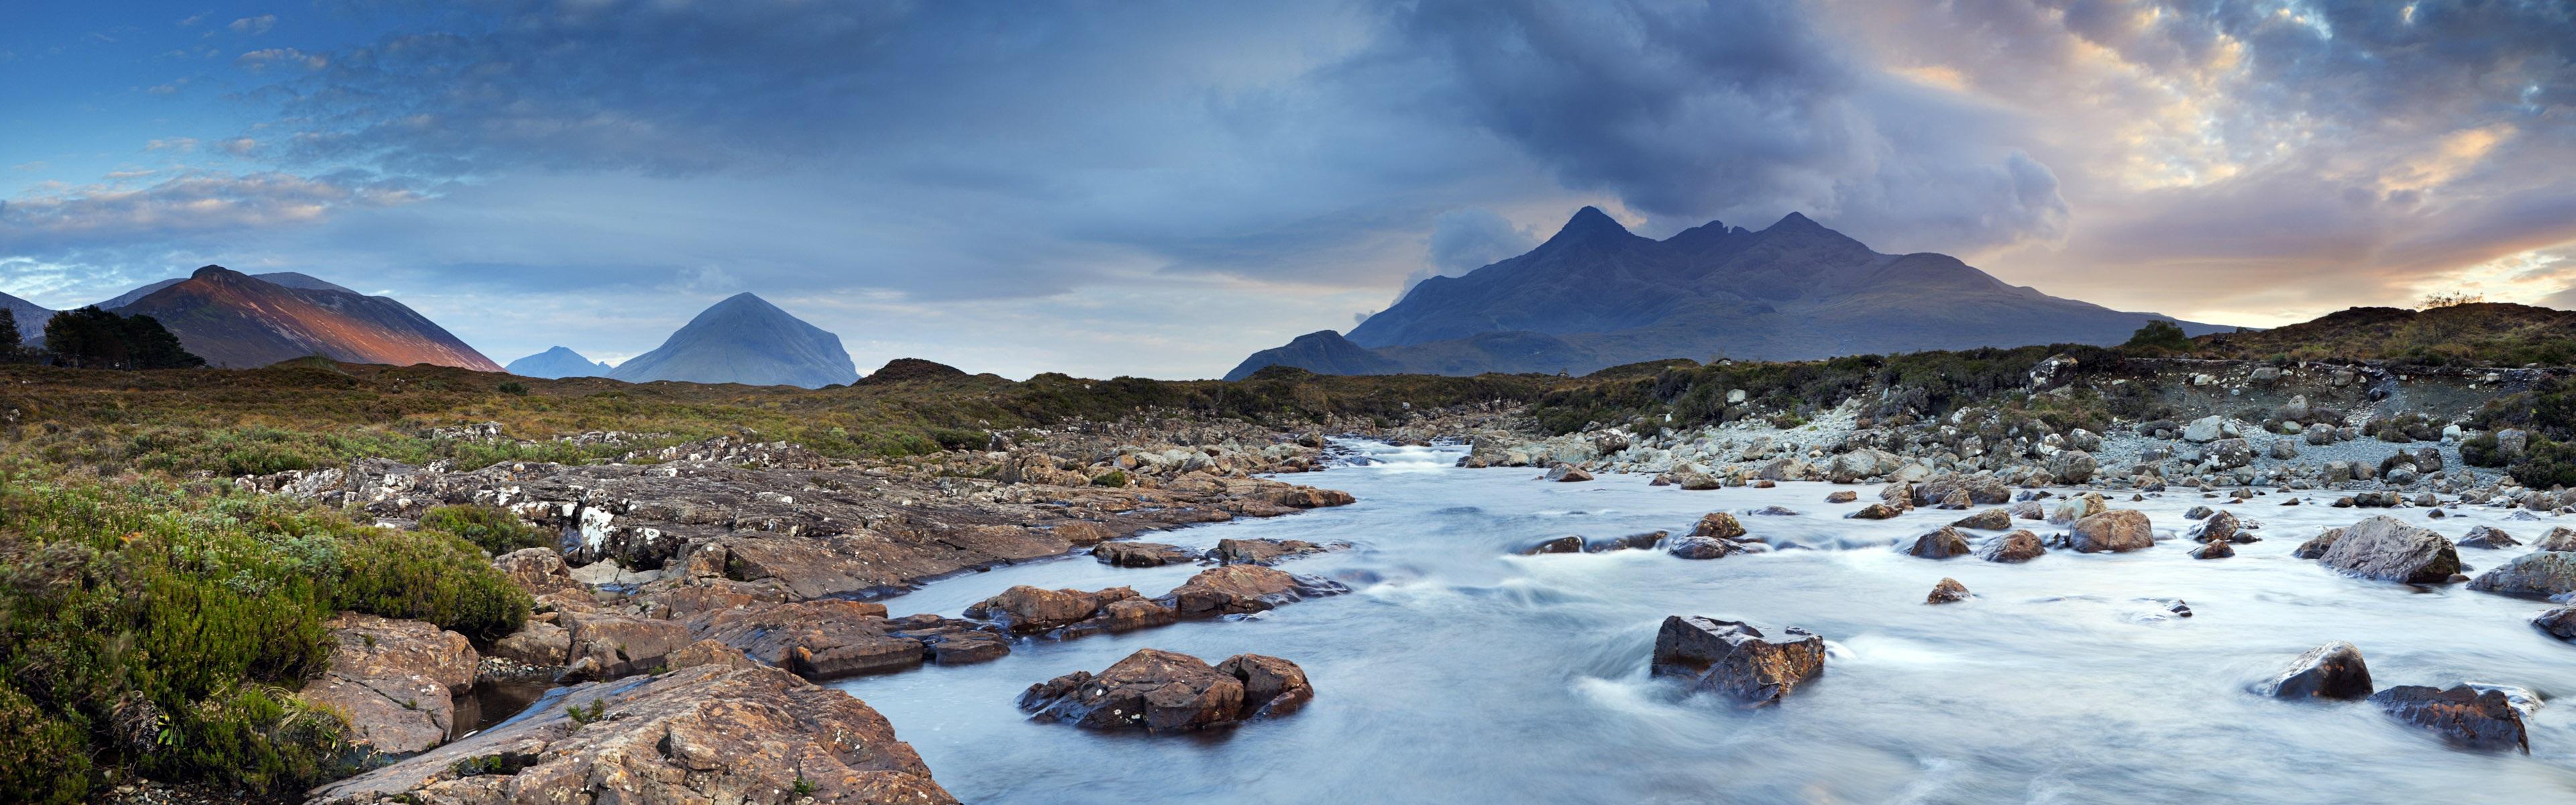 Wallpaper Cuillin Isle Of Skye Scotland Uk Water Clouds